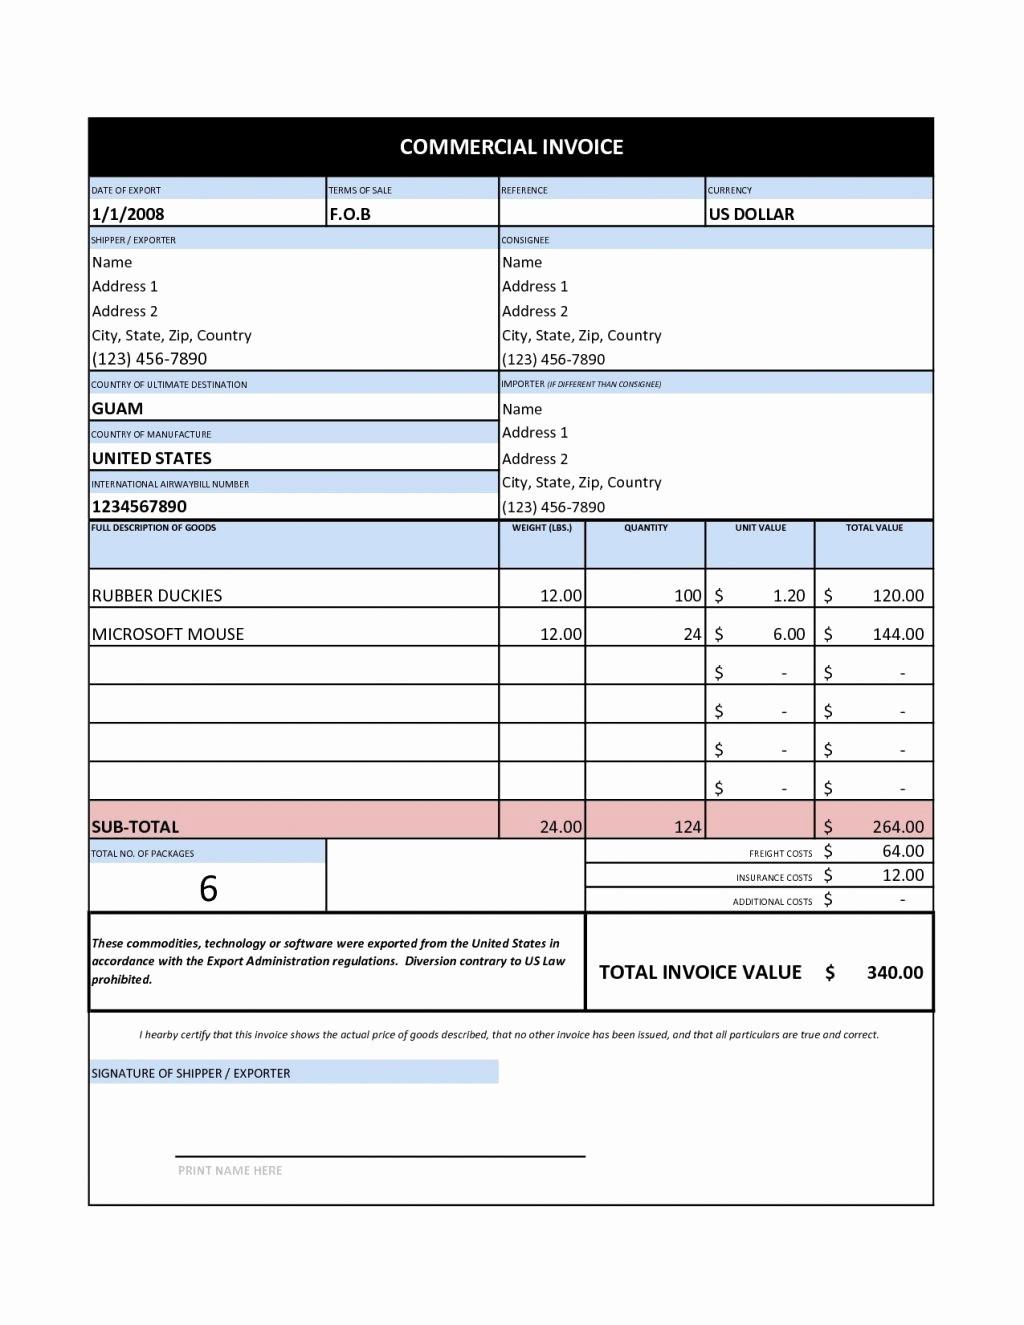 Weld Tracking Spreadsheet Inside Weld Tracking Spreadsheet Sheet Invoice Payment New Lovely Welding